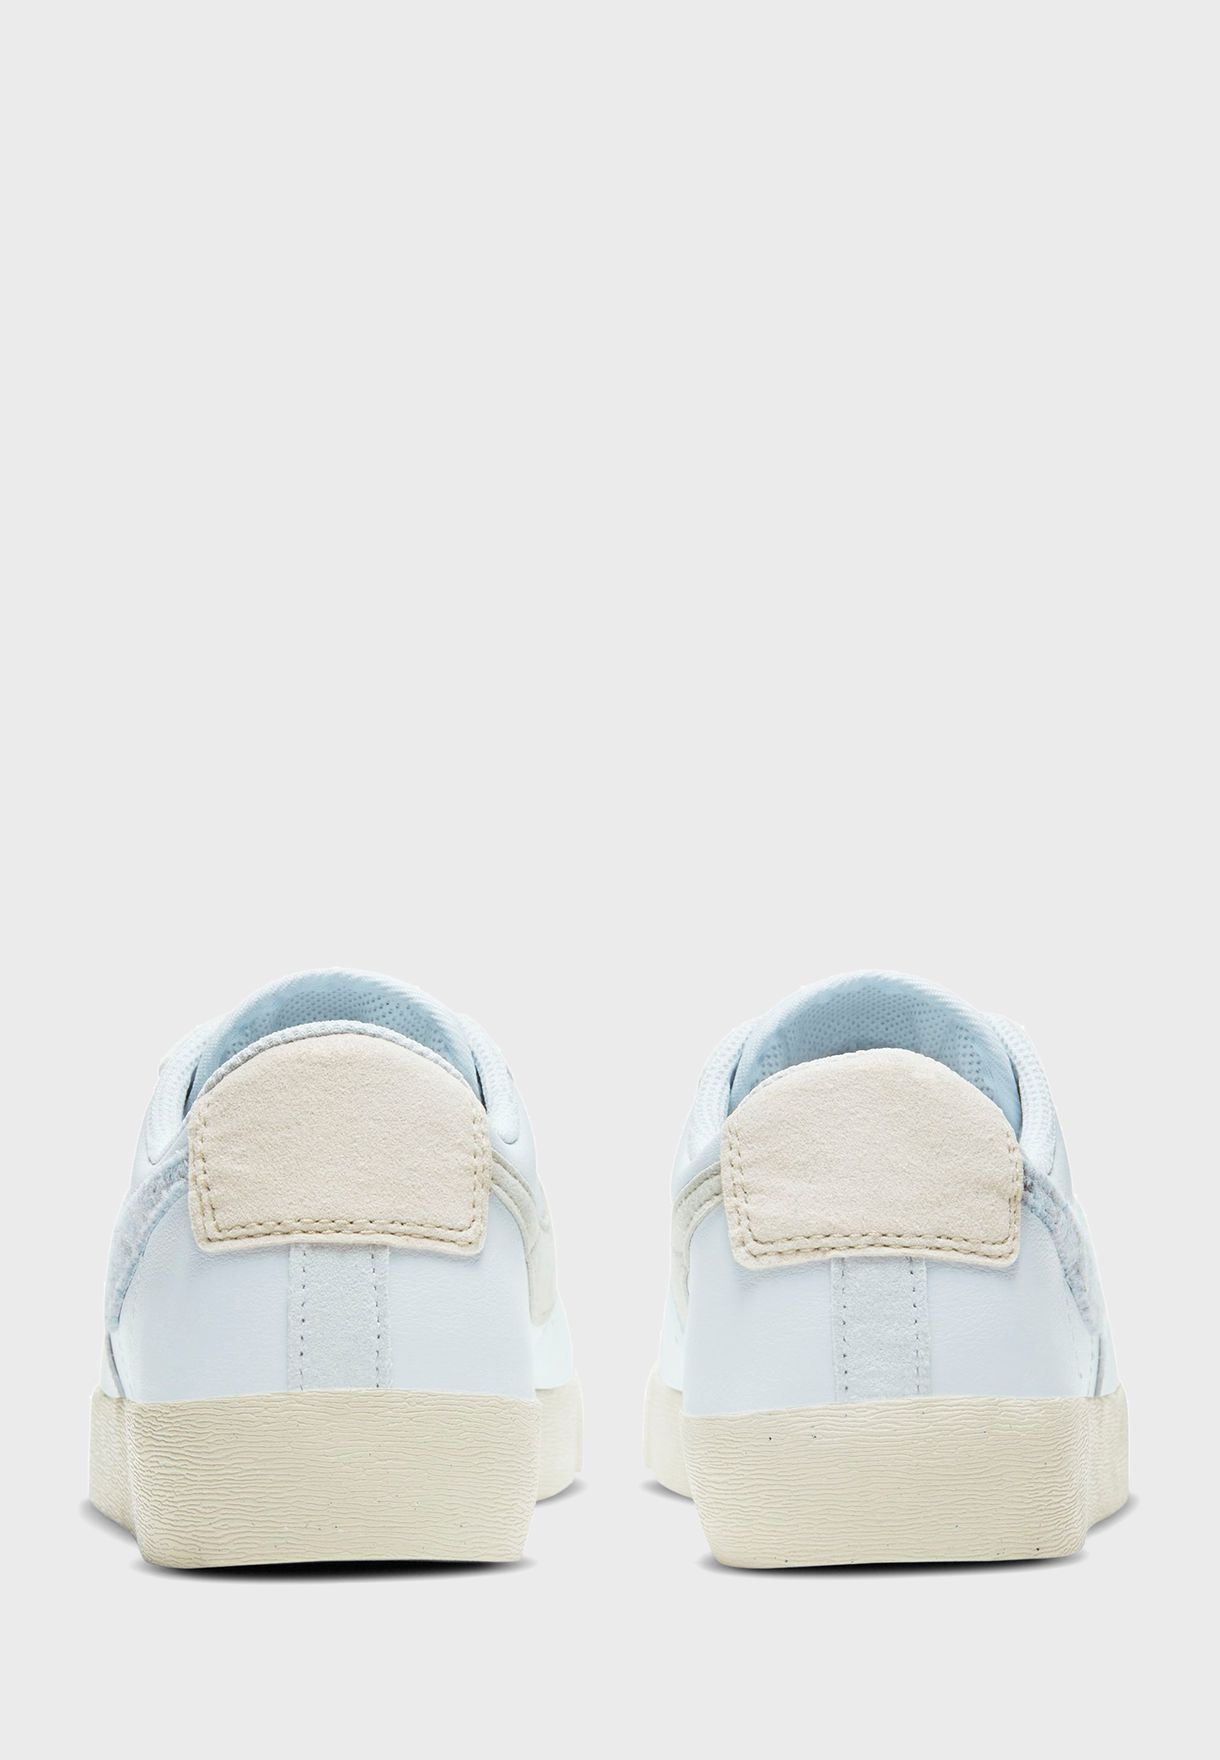 حذاء بليزر لو موف 2 زيرو